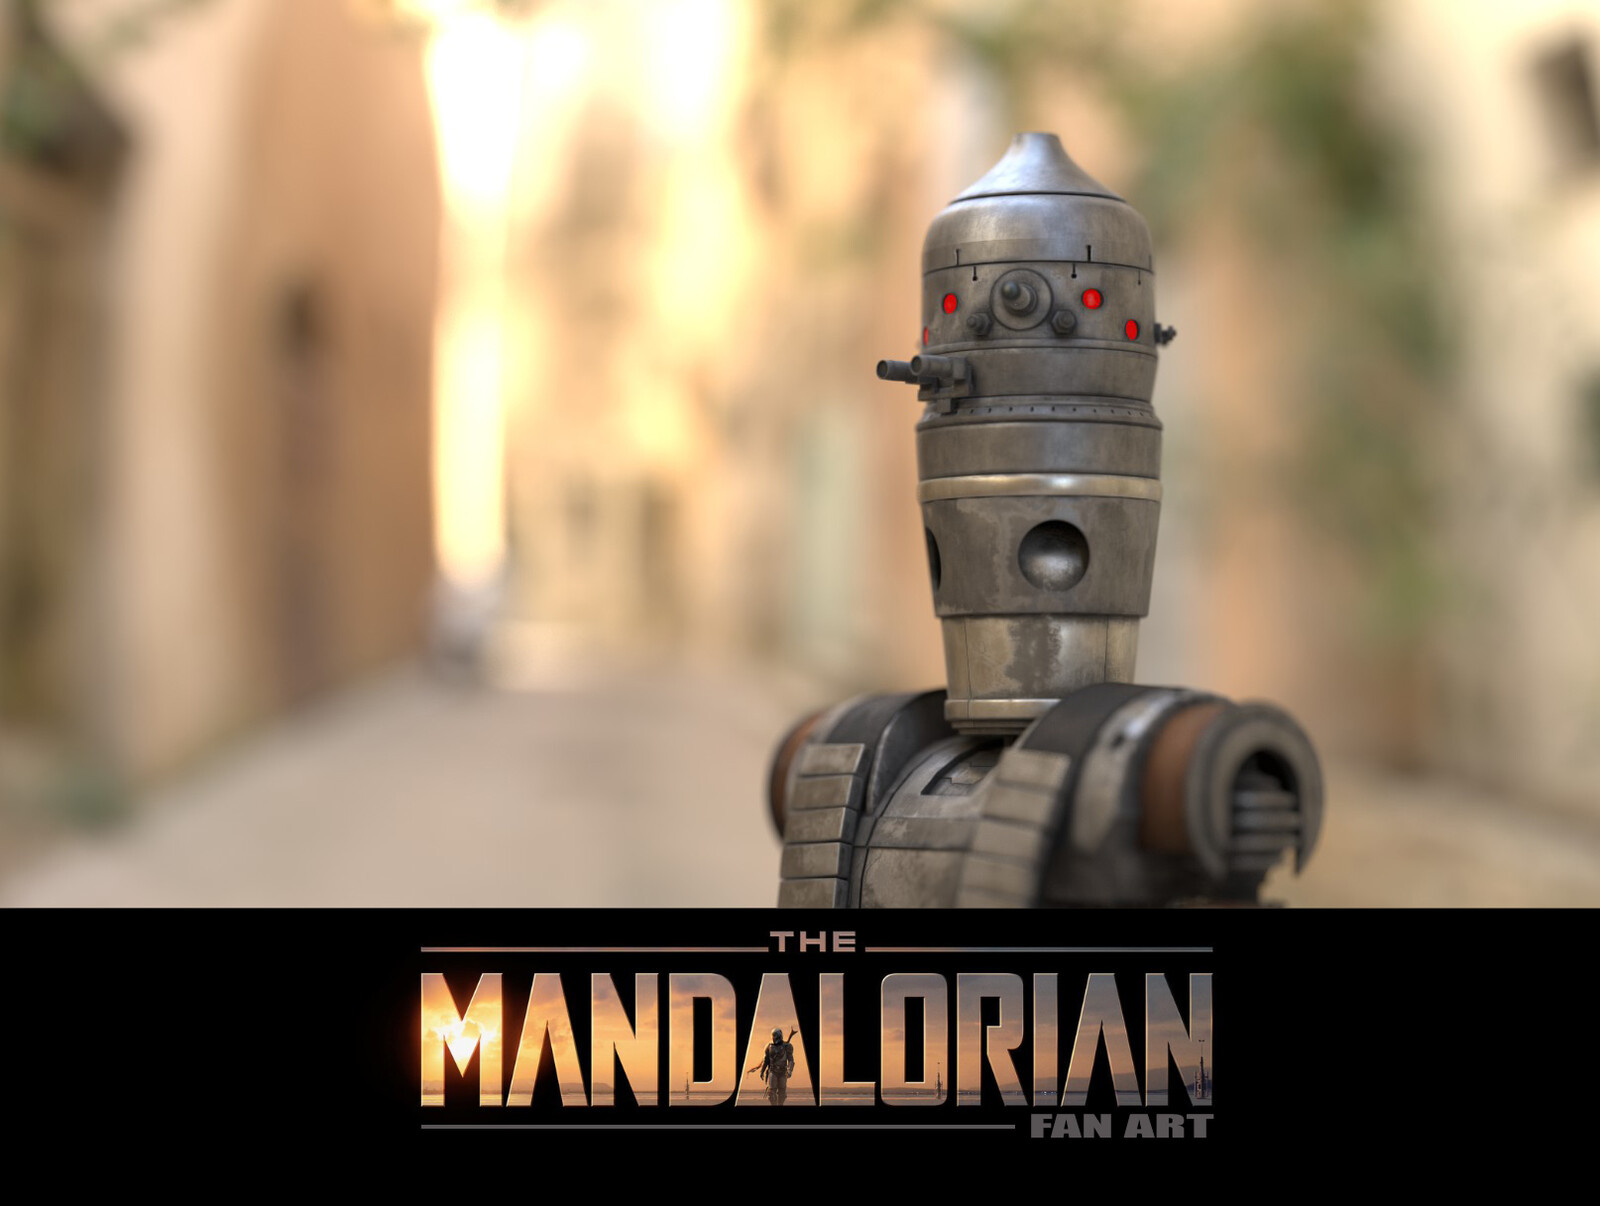 IG-11 The Mandalorian Fan Art